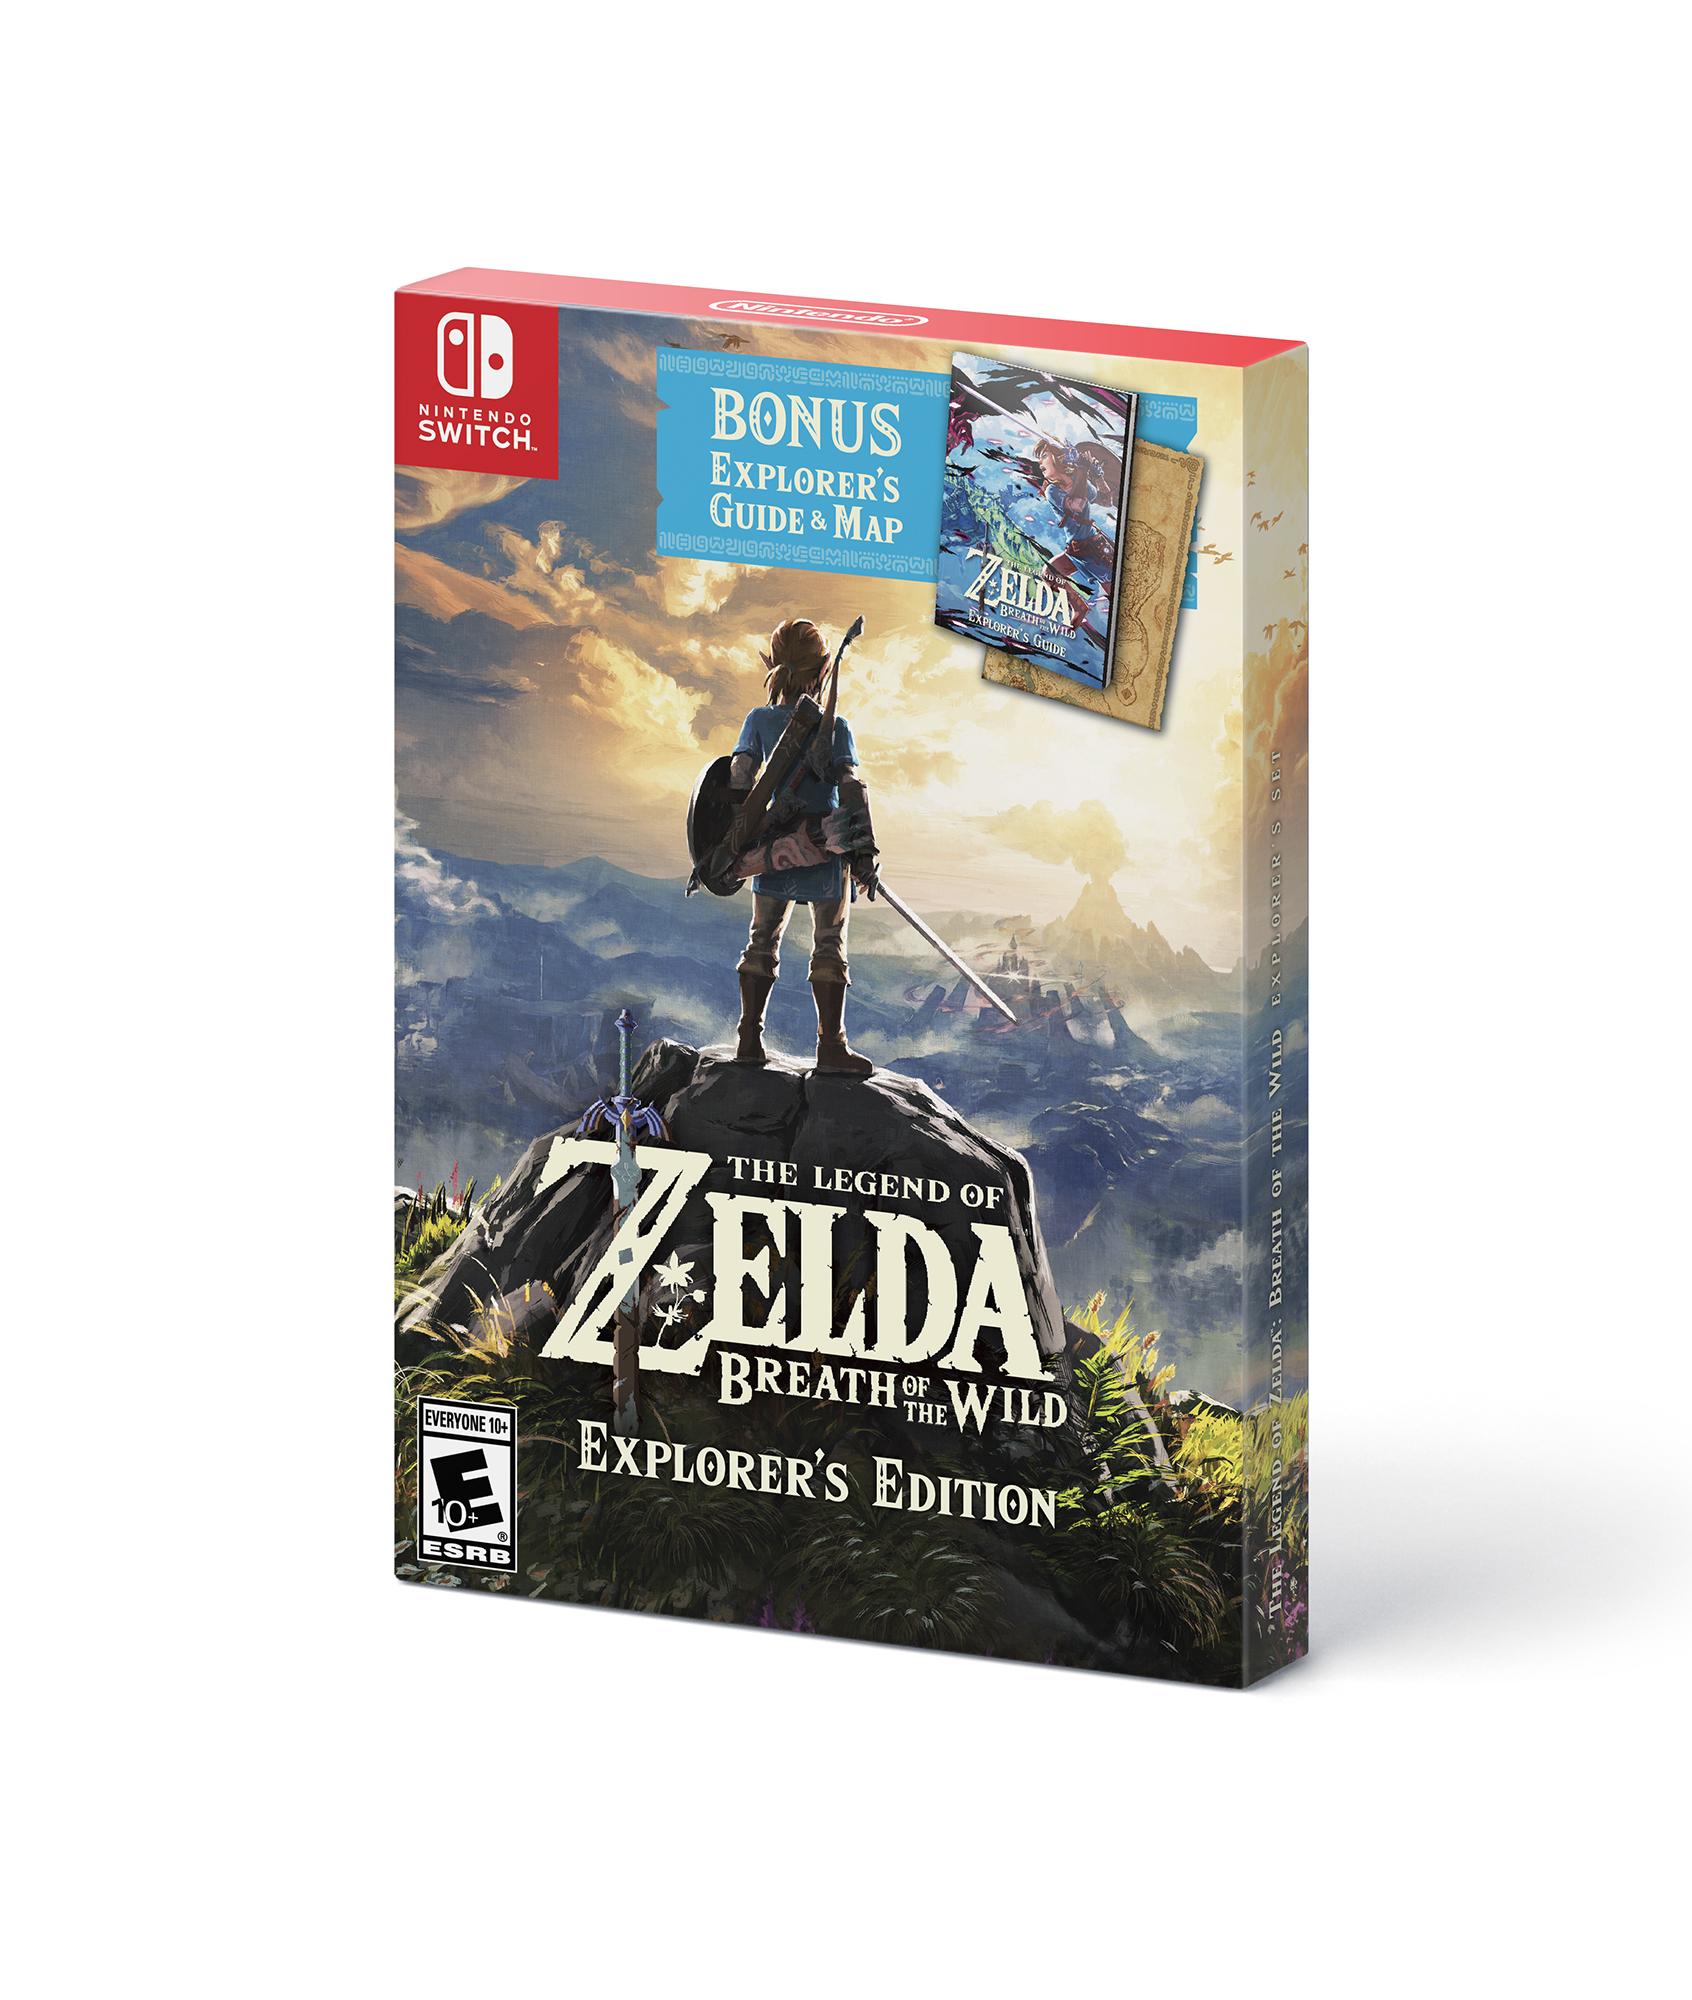 Walmart - Zelda Breath of the Wild Explorer ed. $49 pickup - YMMV